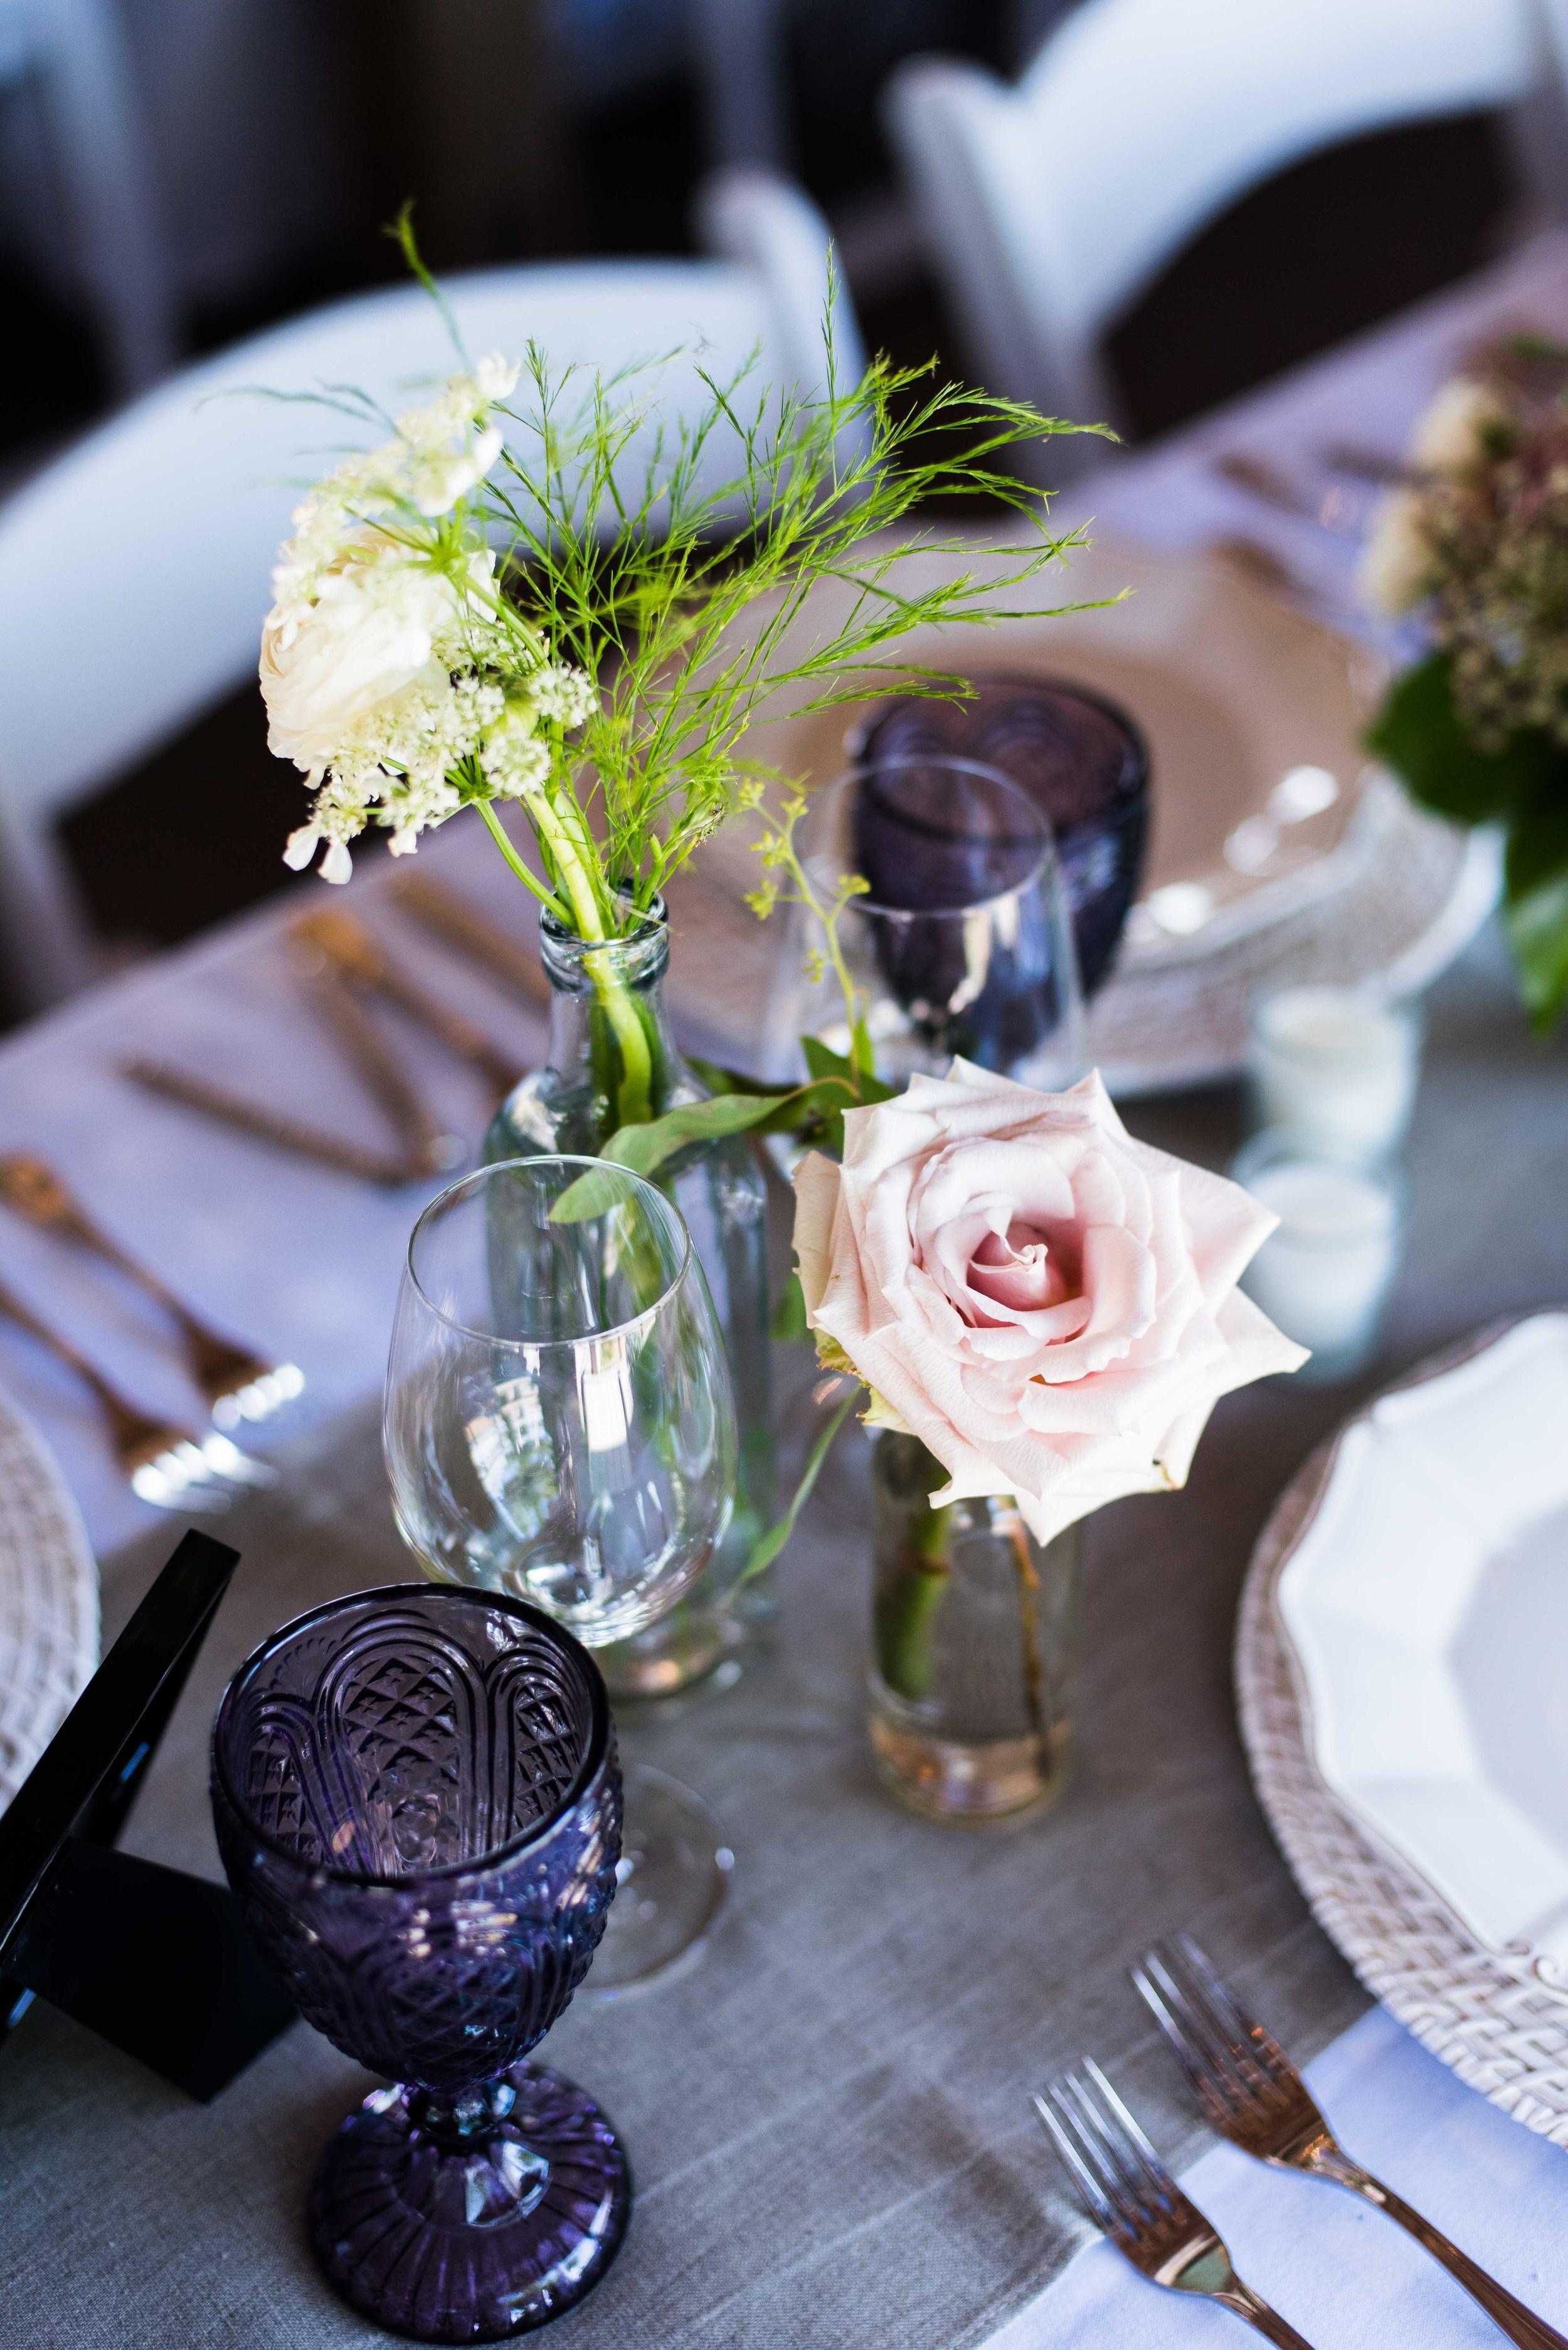 thompson-island-wedding-flowers